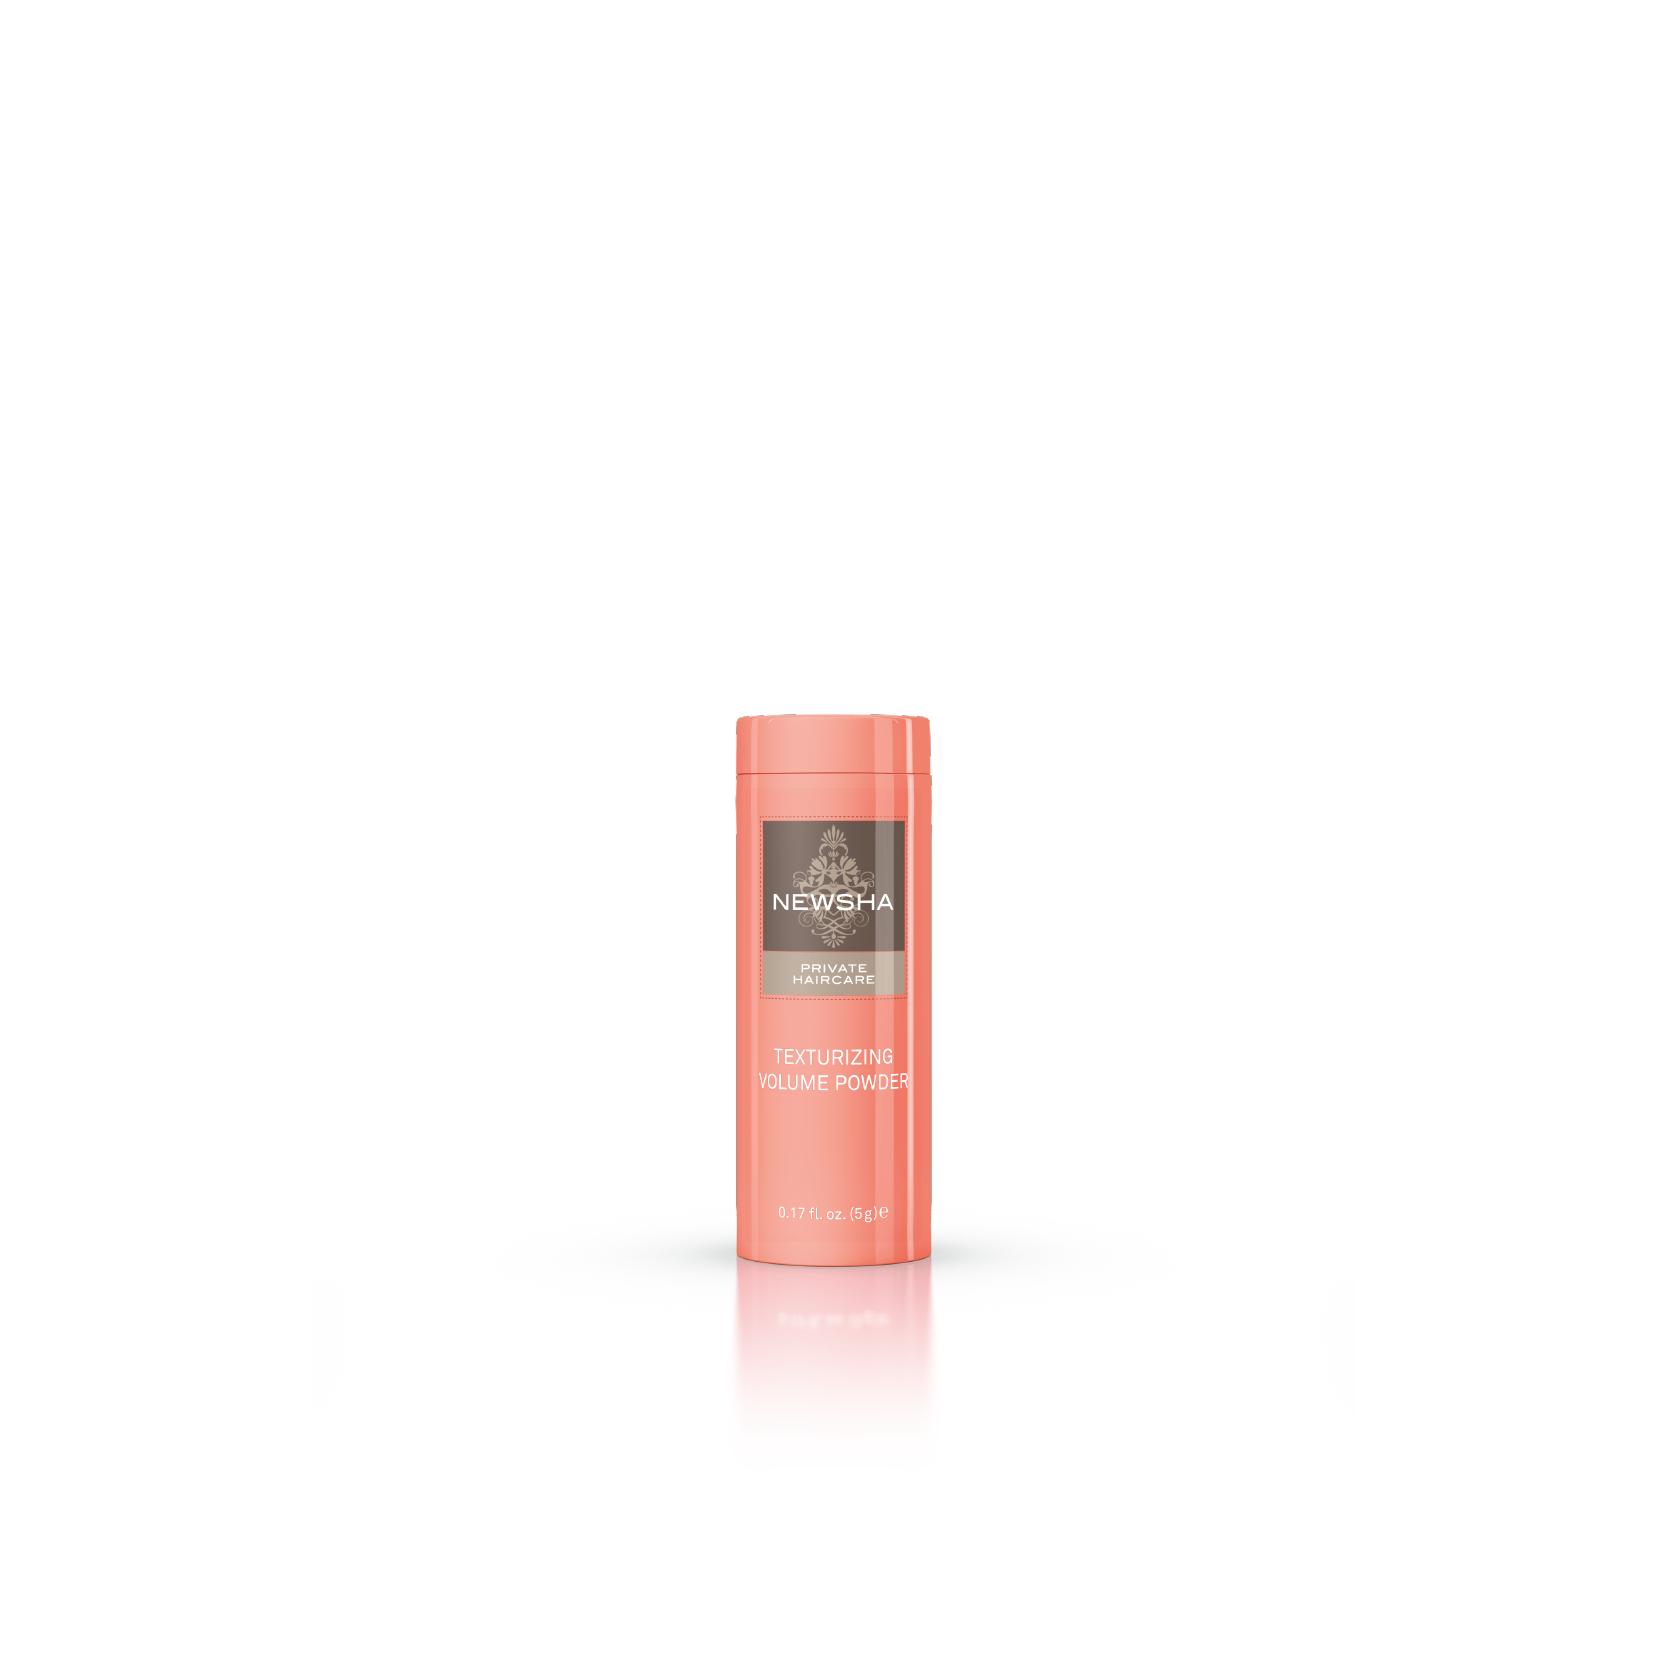 Newsha Product Shots-Texturizing Powder.png